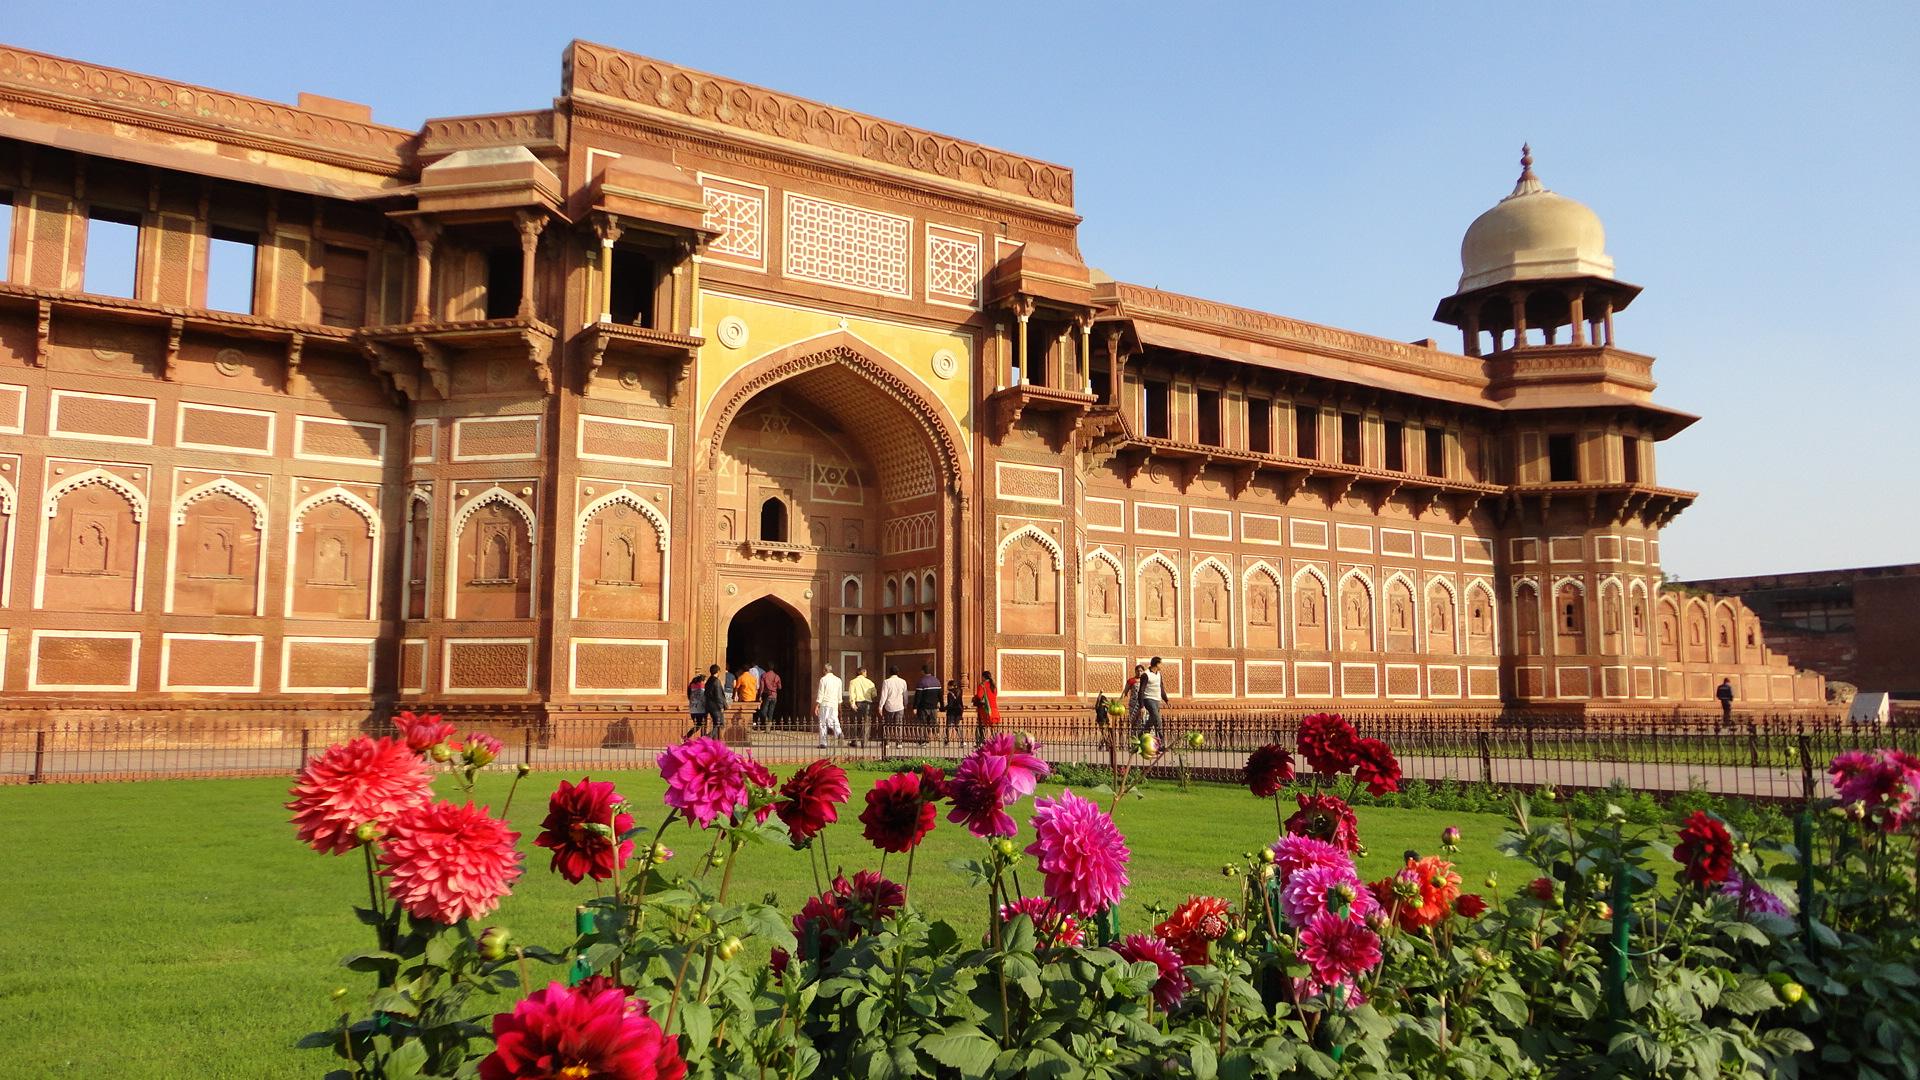 beautiful picture of taj mahal's gate